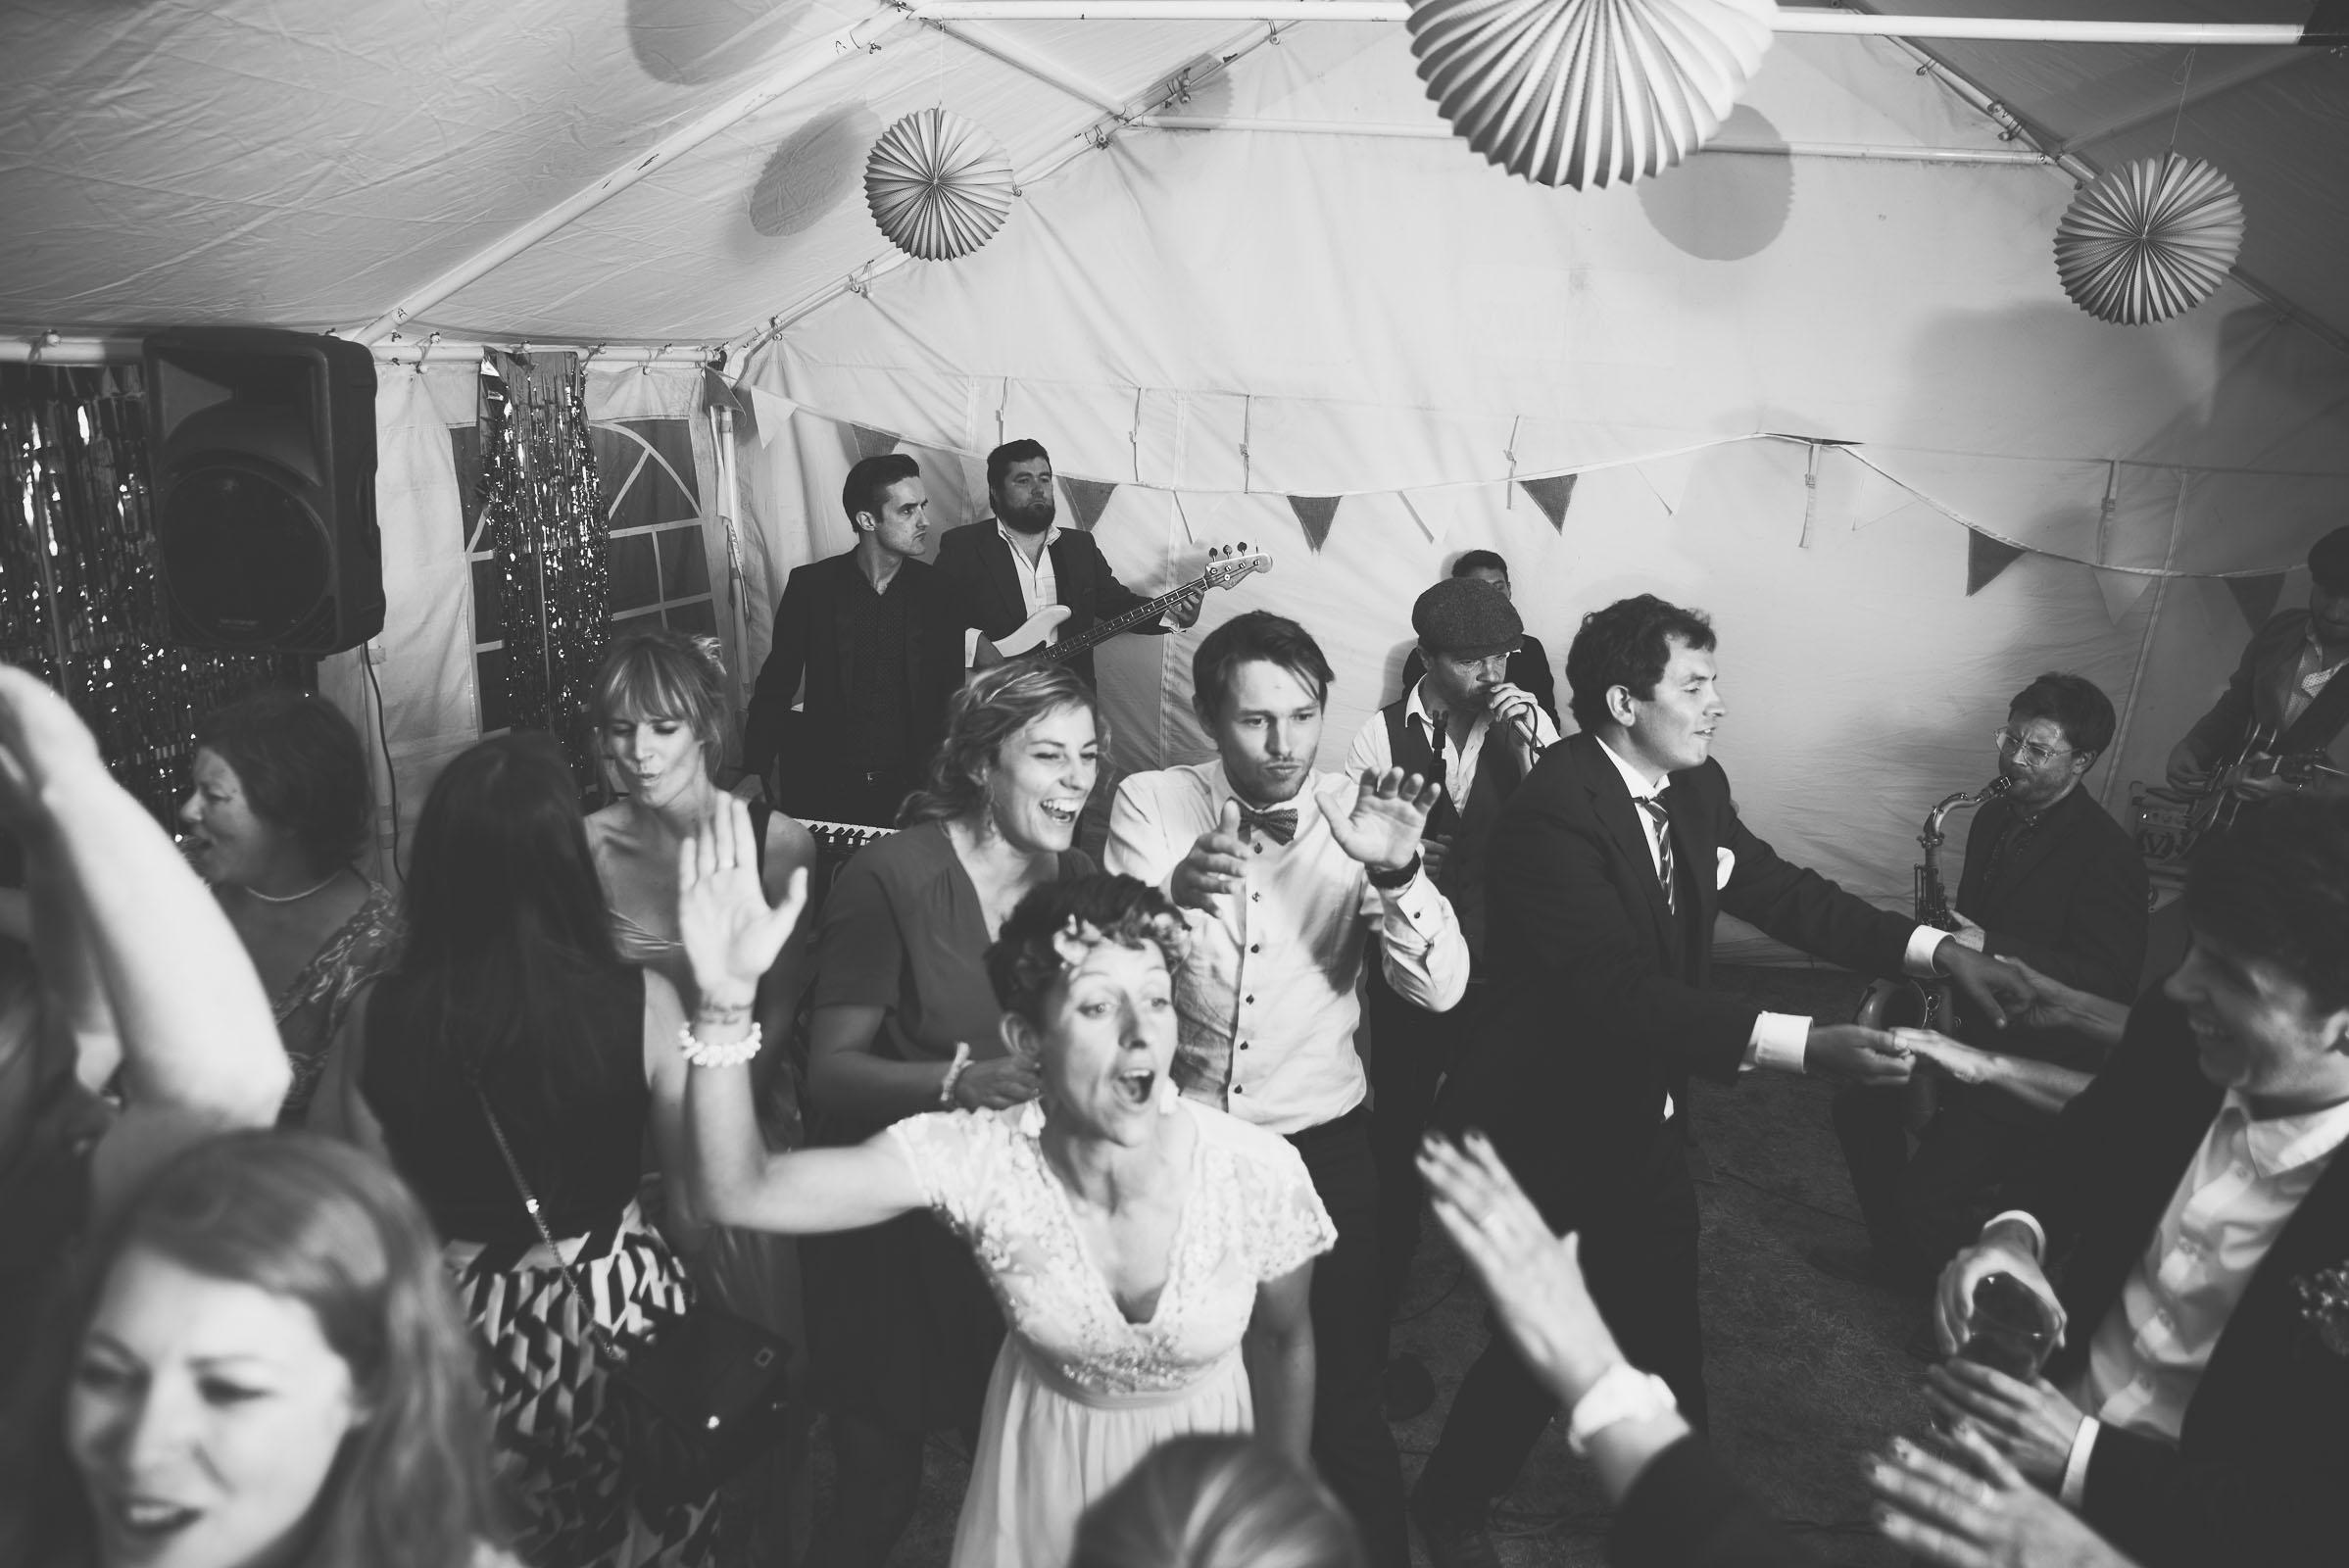 Hitchin_wedding_St_Pauls_Waldenbury_Royston_Wedding_Photographer-64.jpg